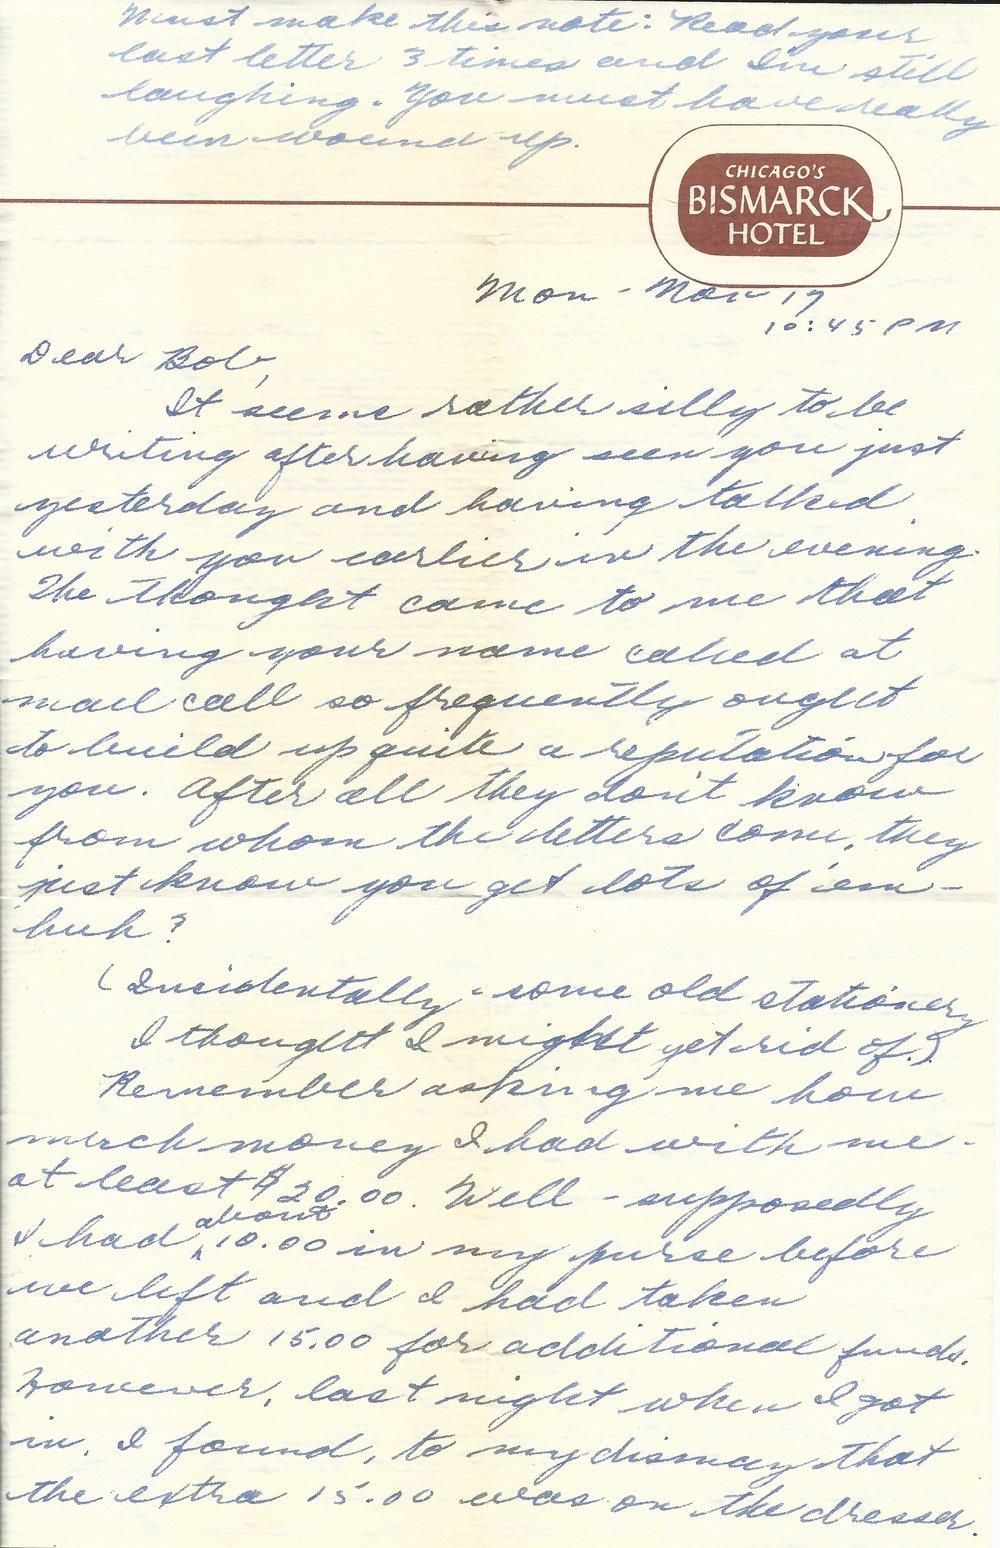 8. Nov. 17, 1952 (Oma)_Page_2.jpg